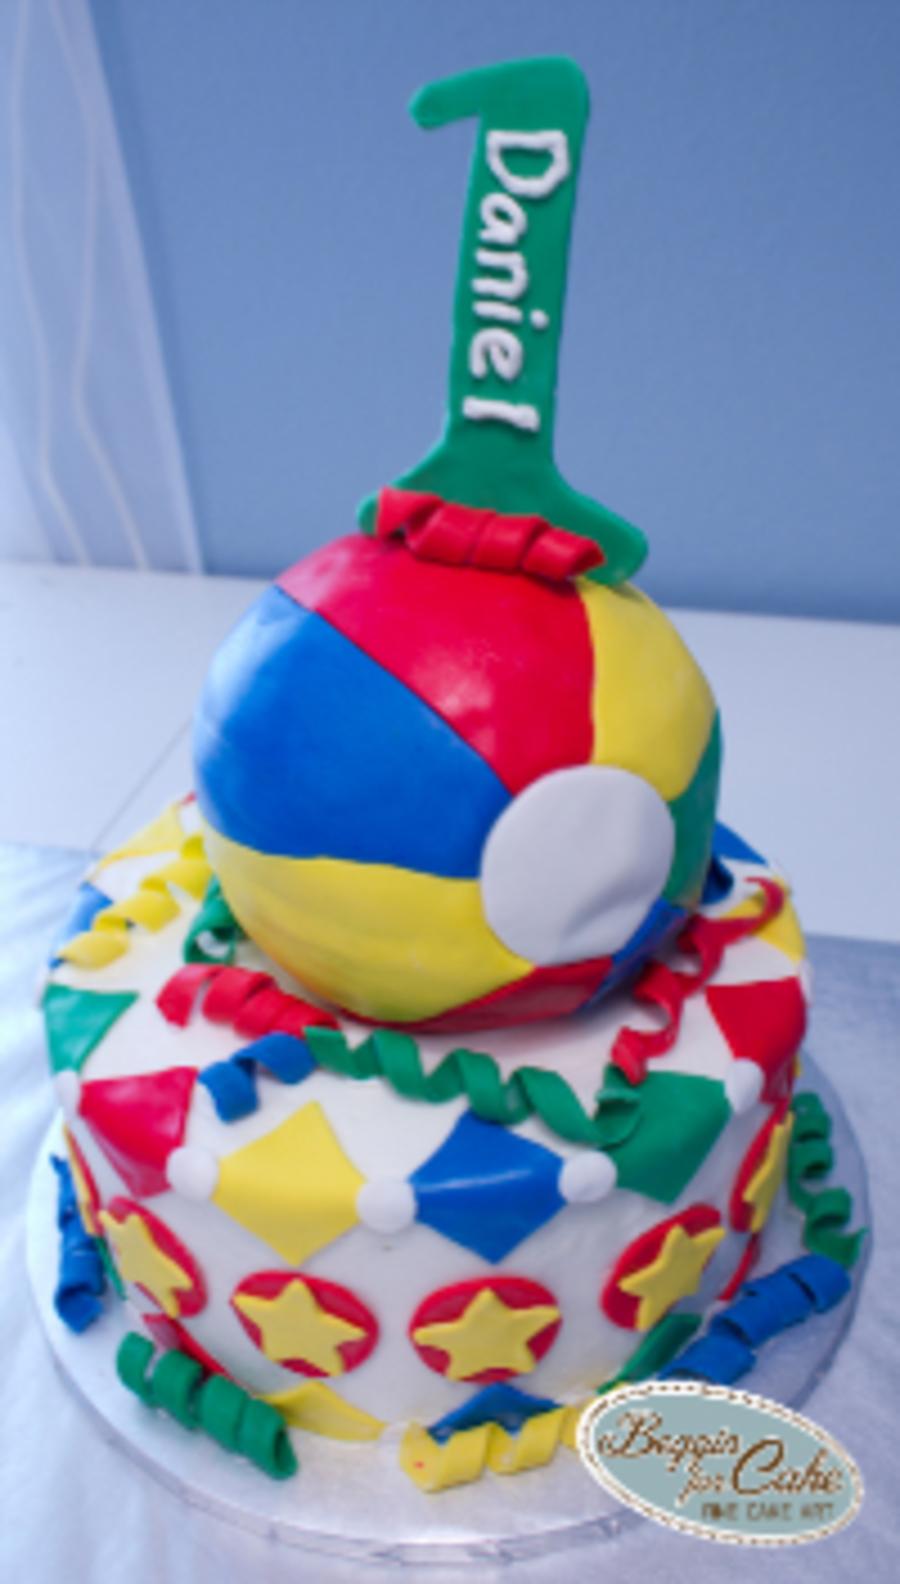 Strange Primary Color Beach Ball Cake Cakecentral Com Birthday Cards Printable Benkemecafe Filternl